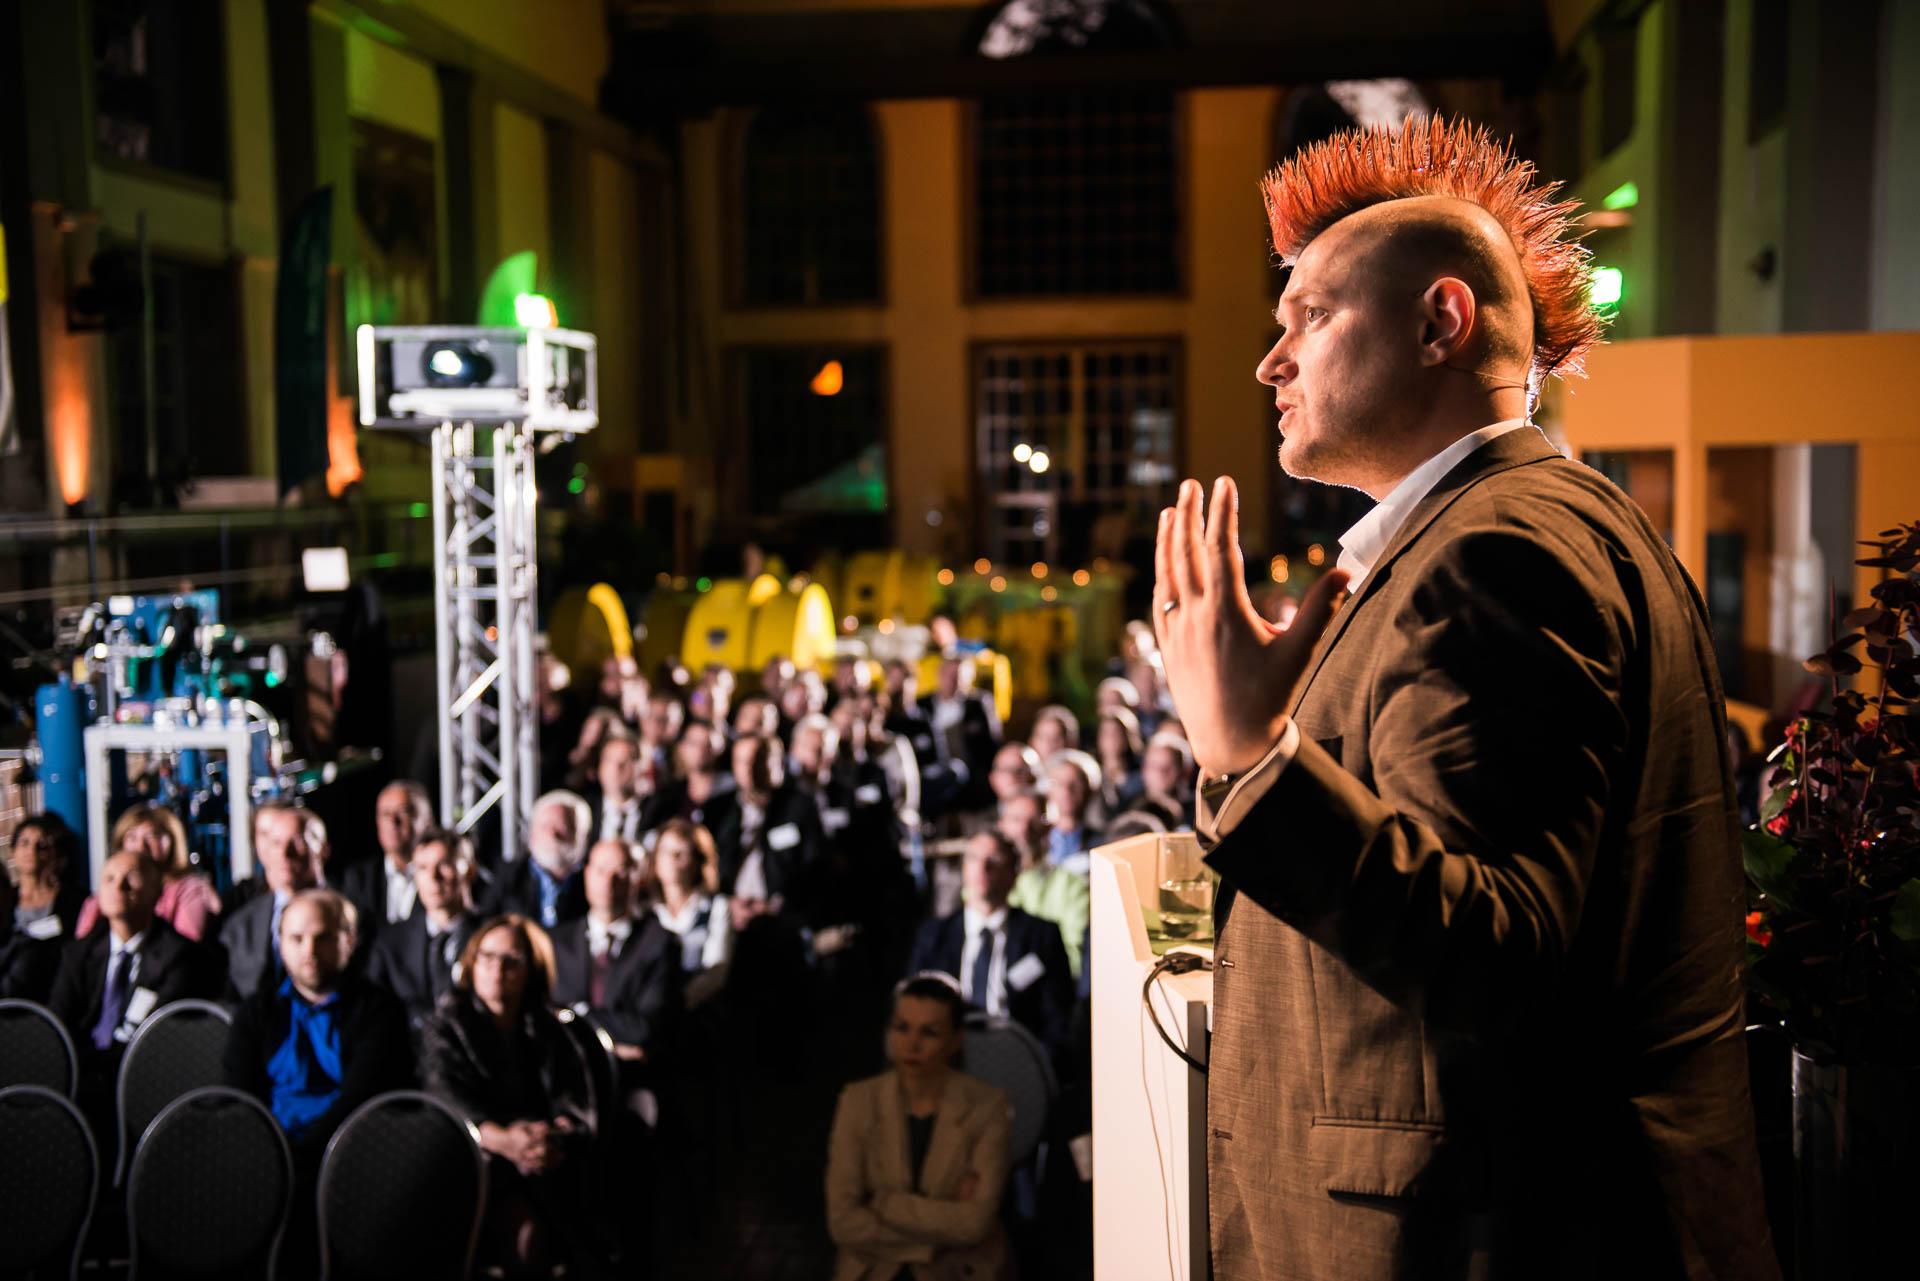 AÜW Event Sprecher